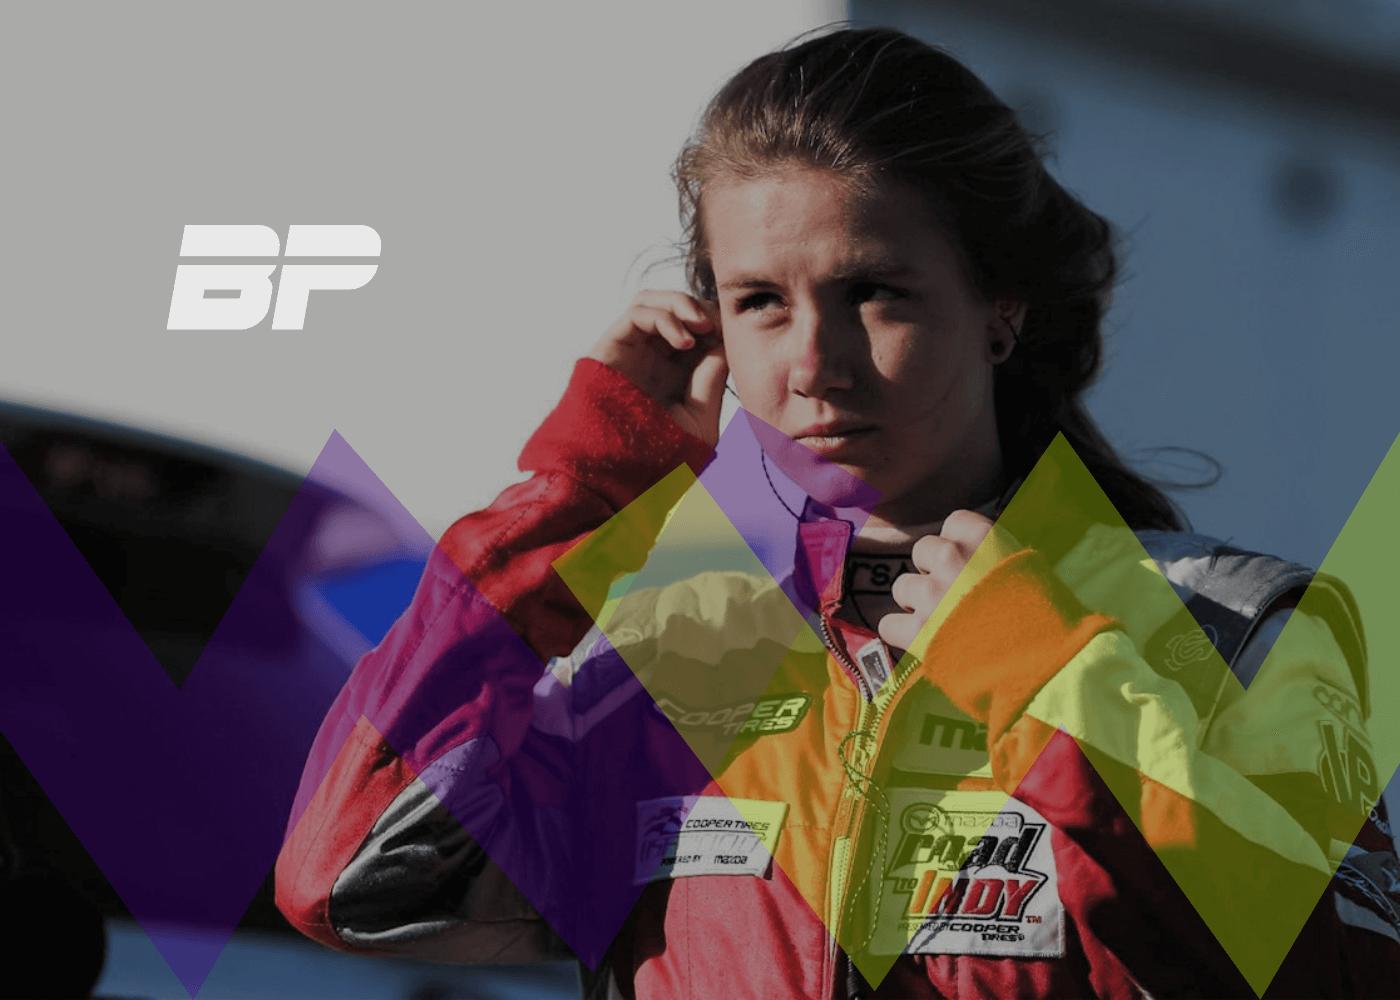 Foto de Lista da W Series, com pilota brasileira Bruna Tomaselli, finalista da primeira fase